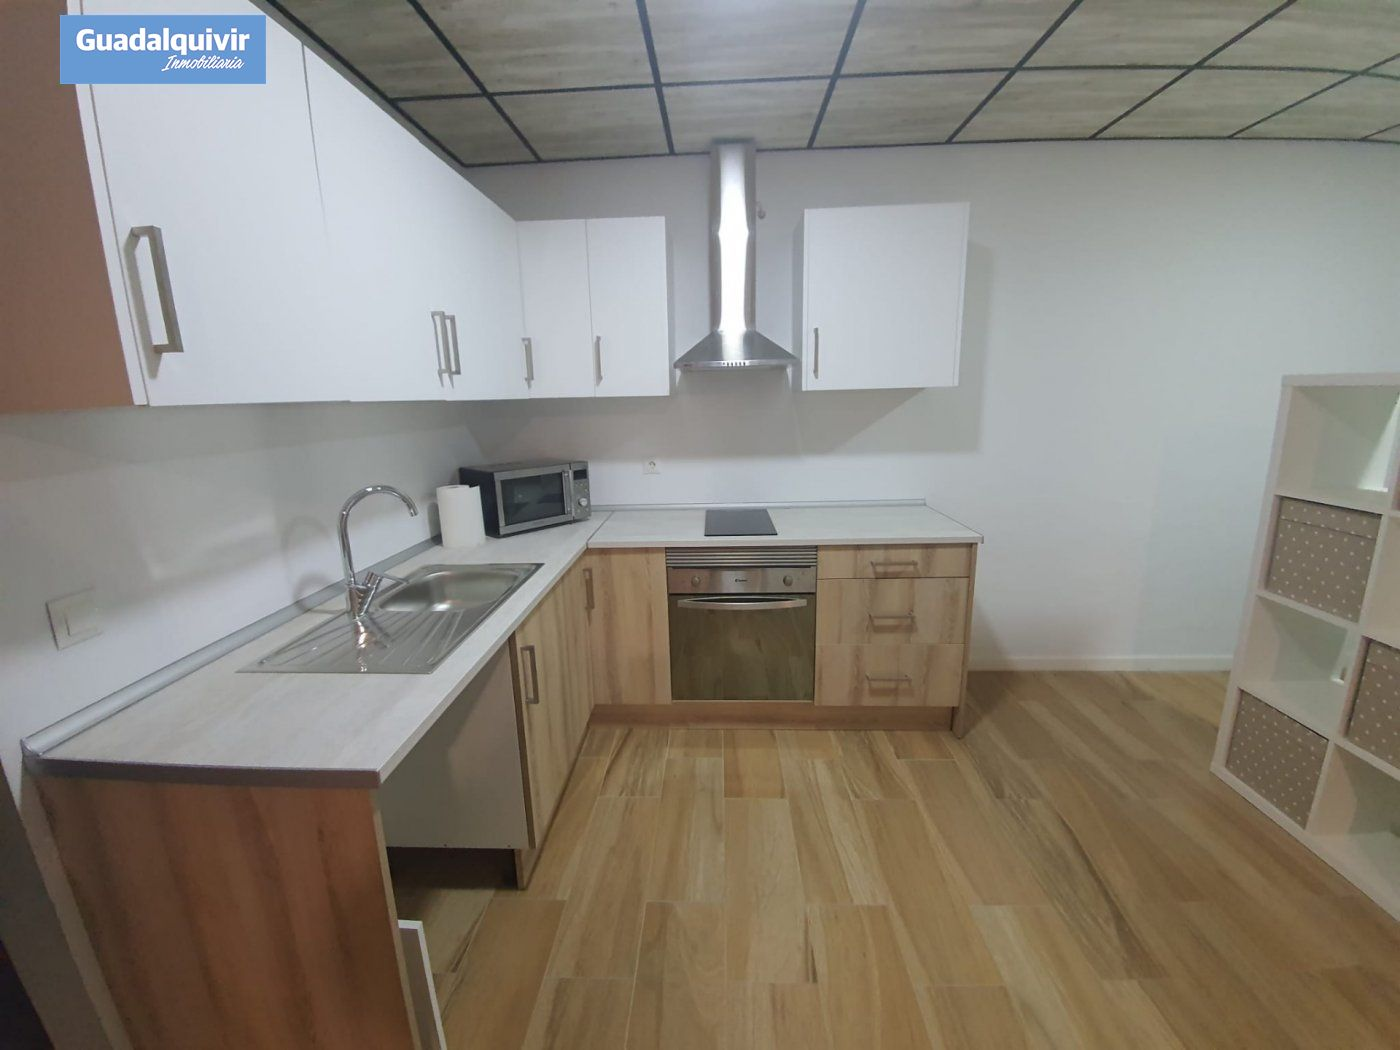 apartamento en montequinto · centro 0€